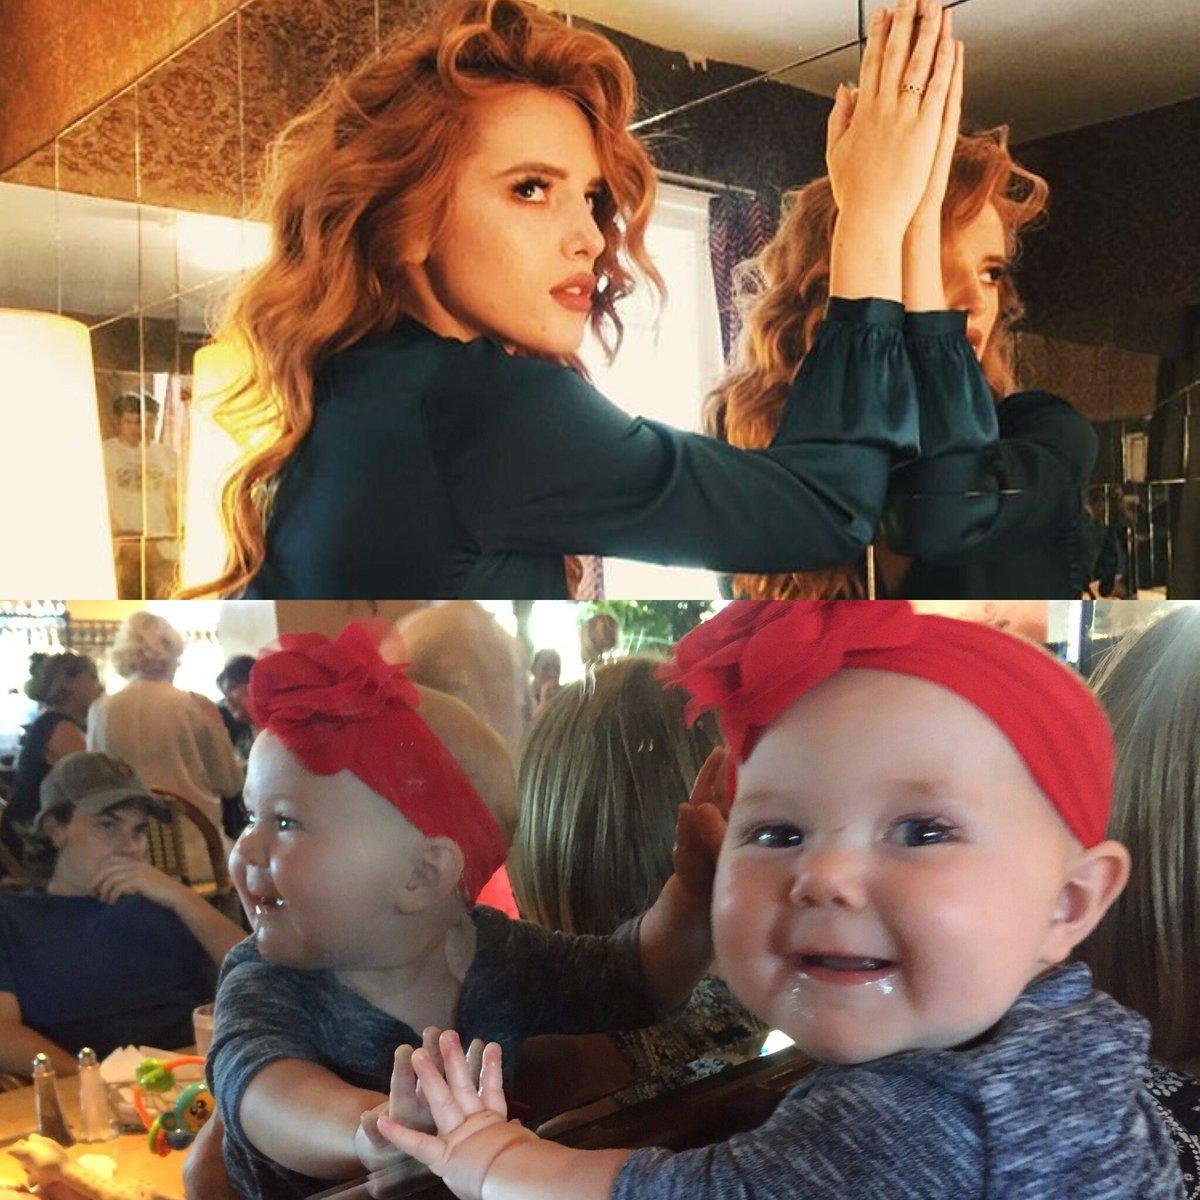 Like Bella like Emma https://t.co/LBUg8UPyu3